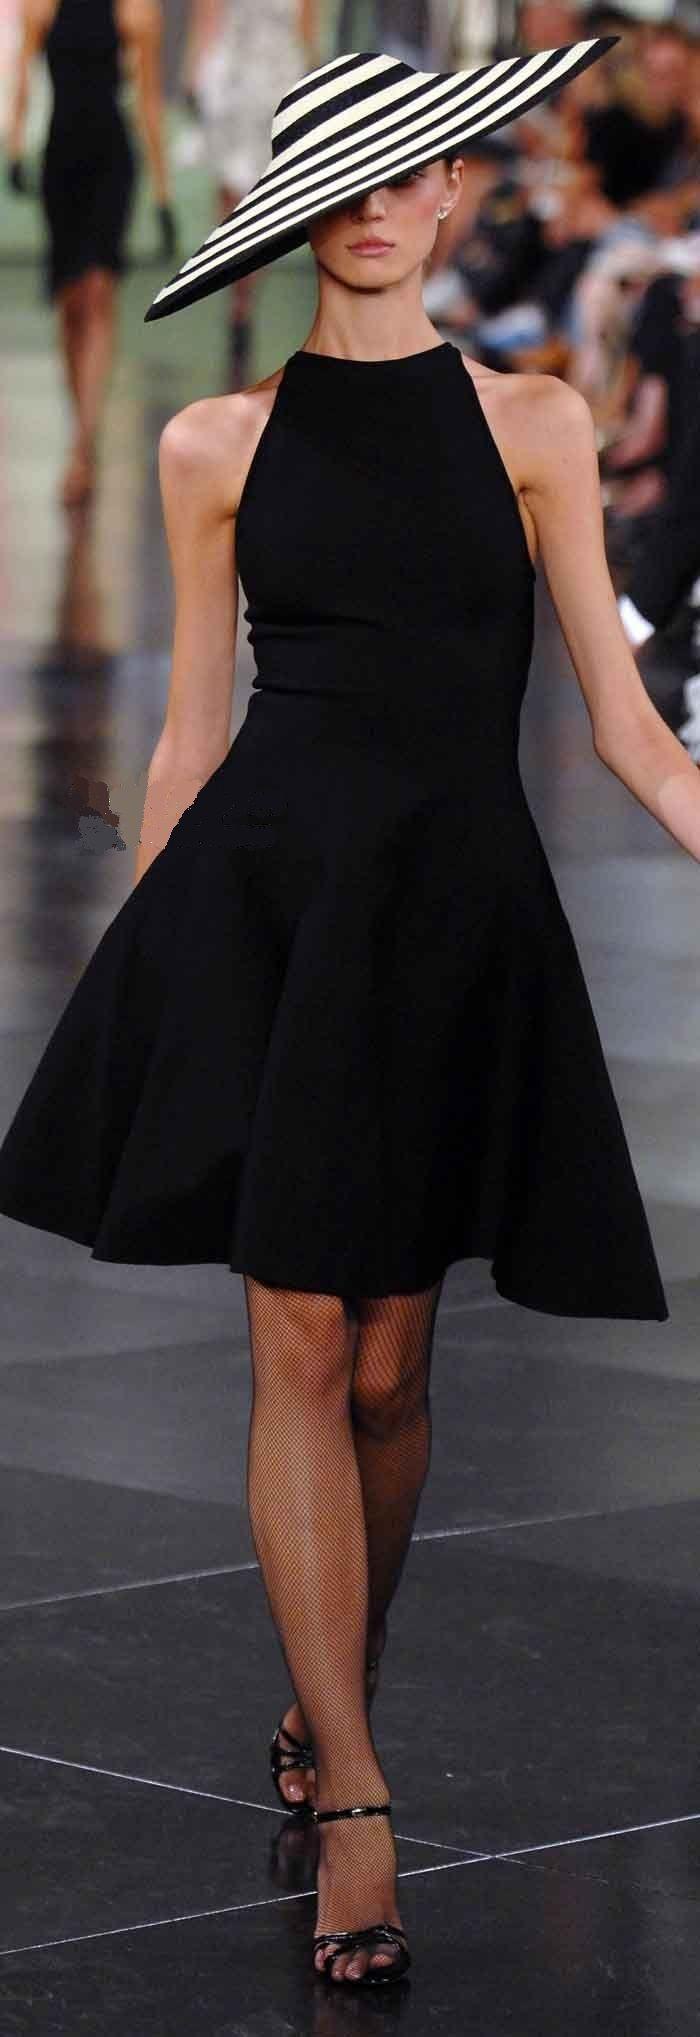 Ralph Lauren - Love the hat! Royal Ascot Fashion at the races Furlong fashion